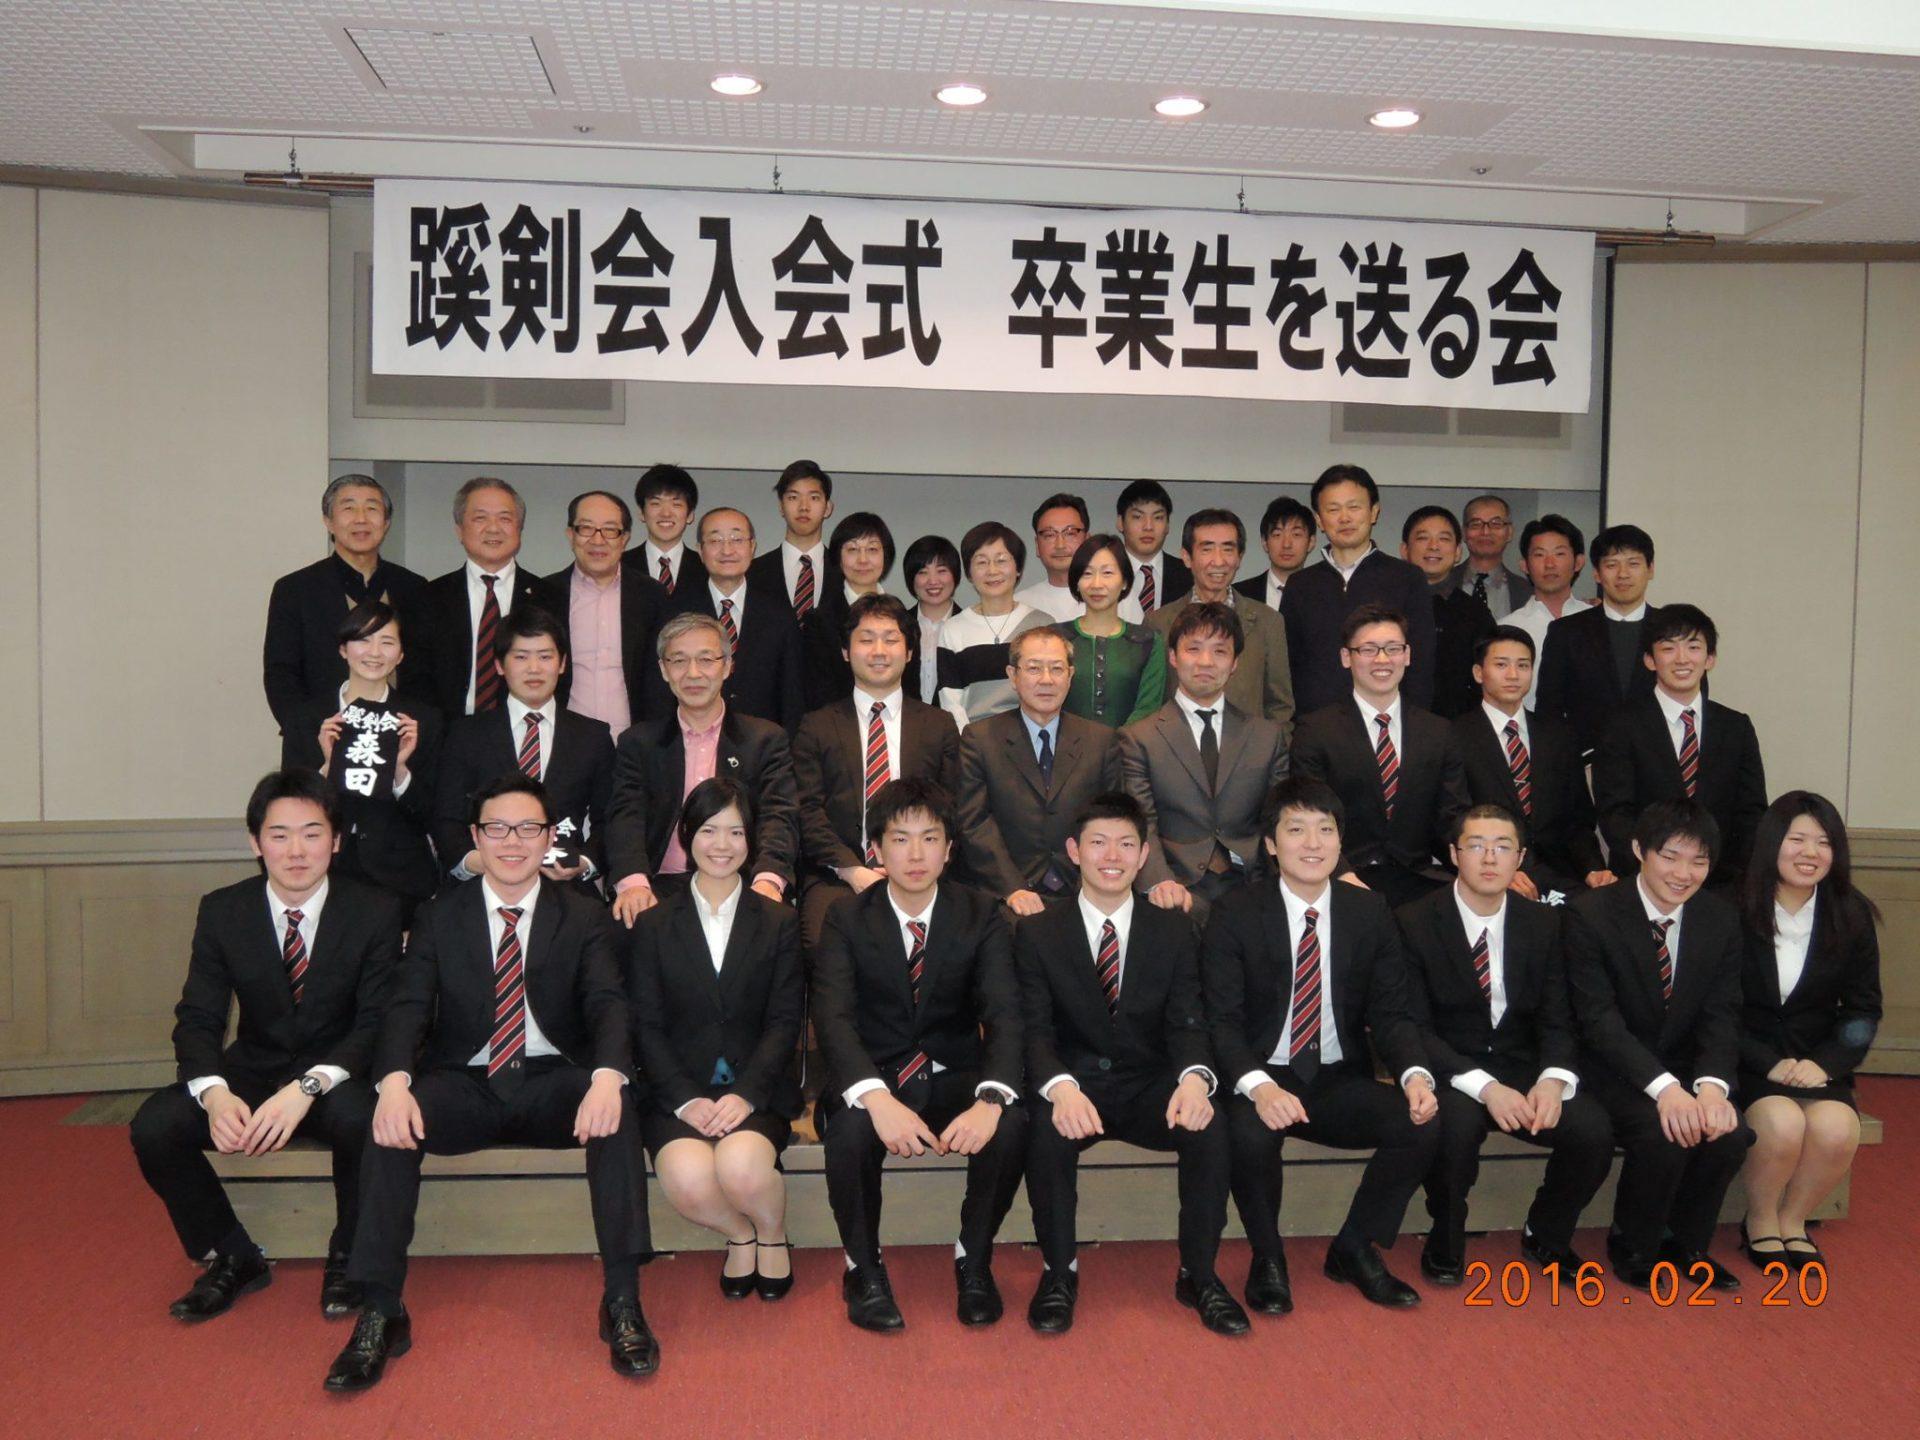 【お礼】蹊剣会総会/卒業生を送る会・蹊剣会入会式